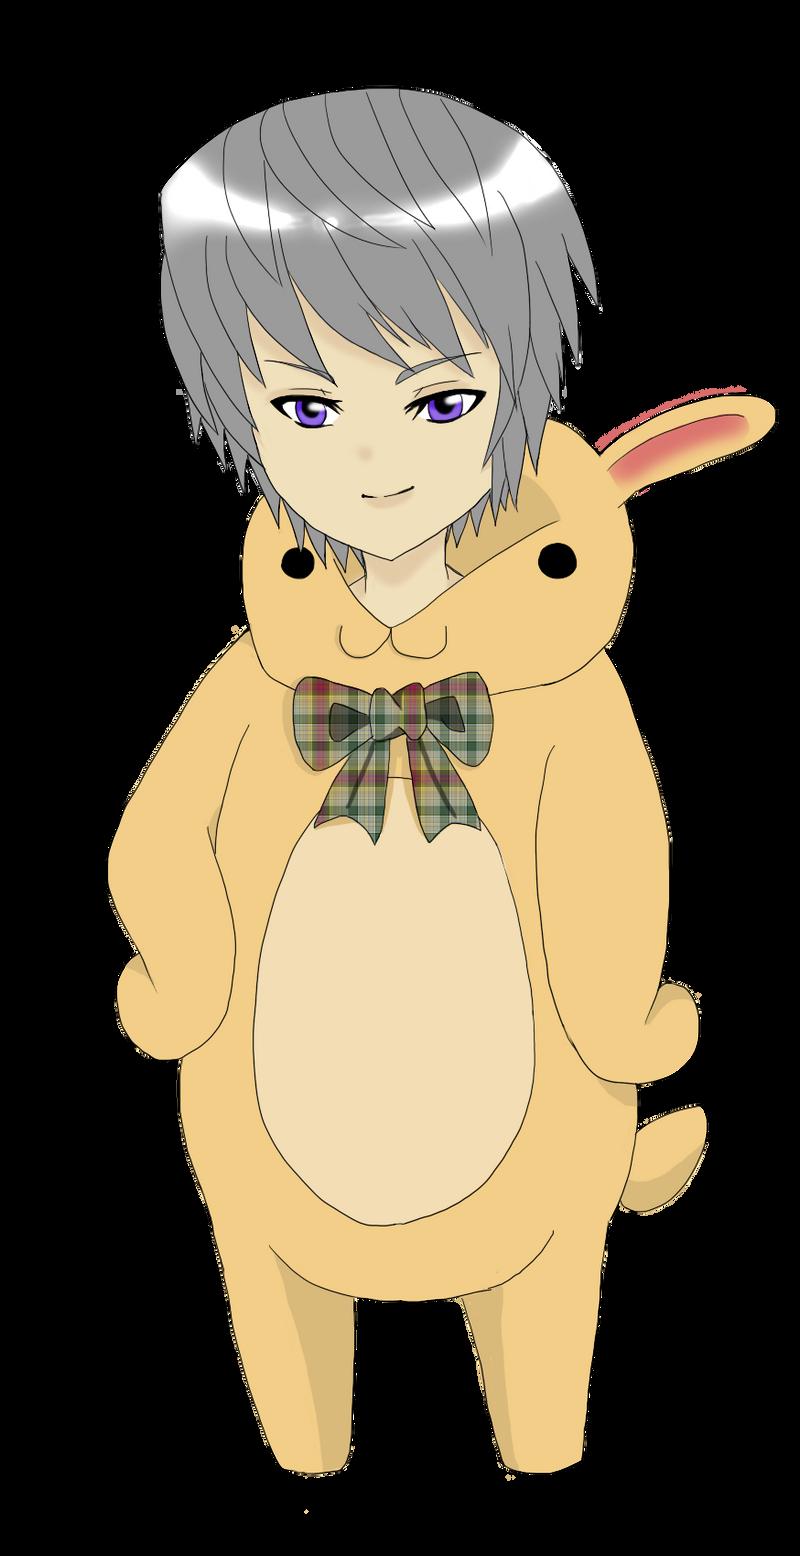 Junjou Romantica: Usagi Chibi by Mikaru5354 on DeviantArt